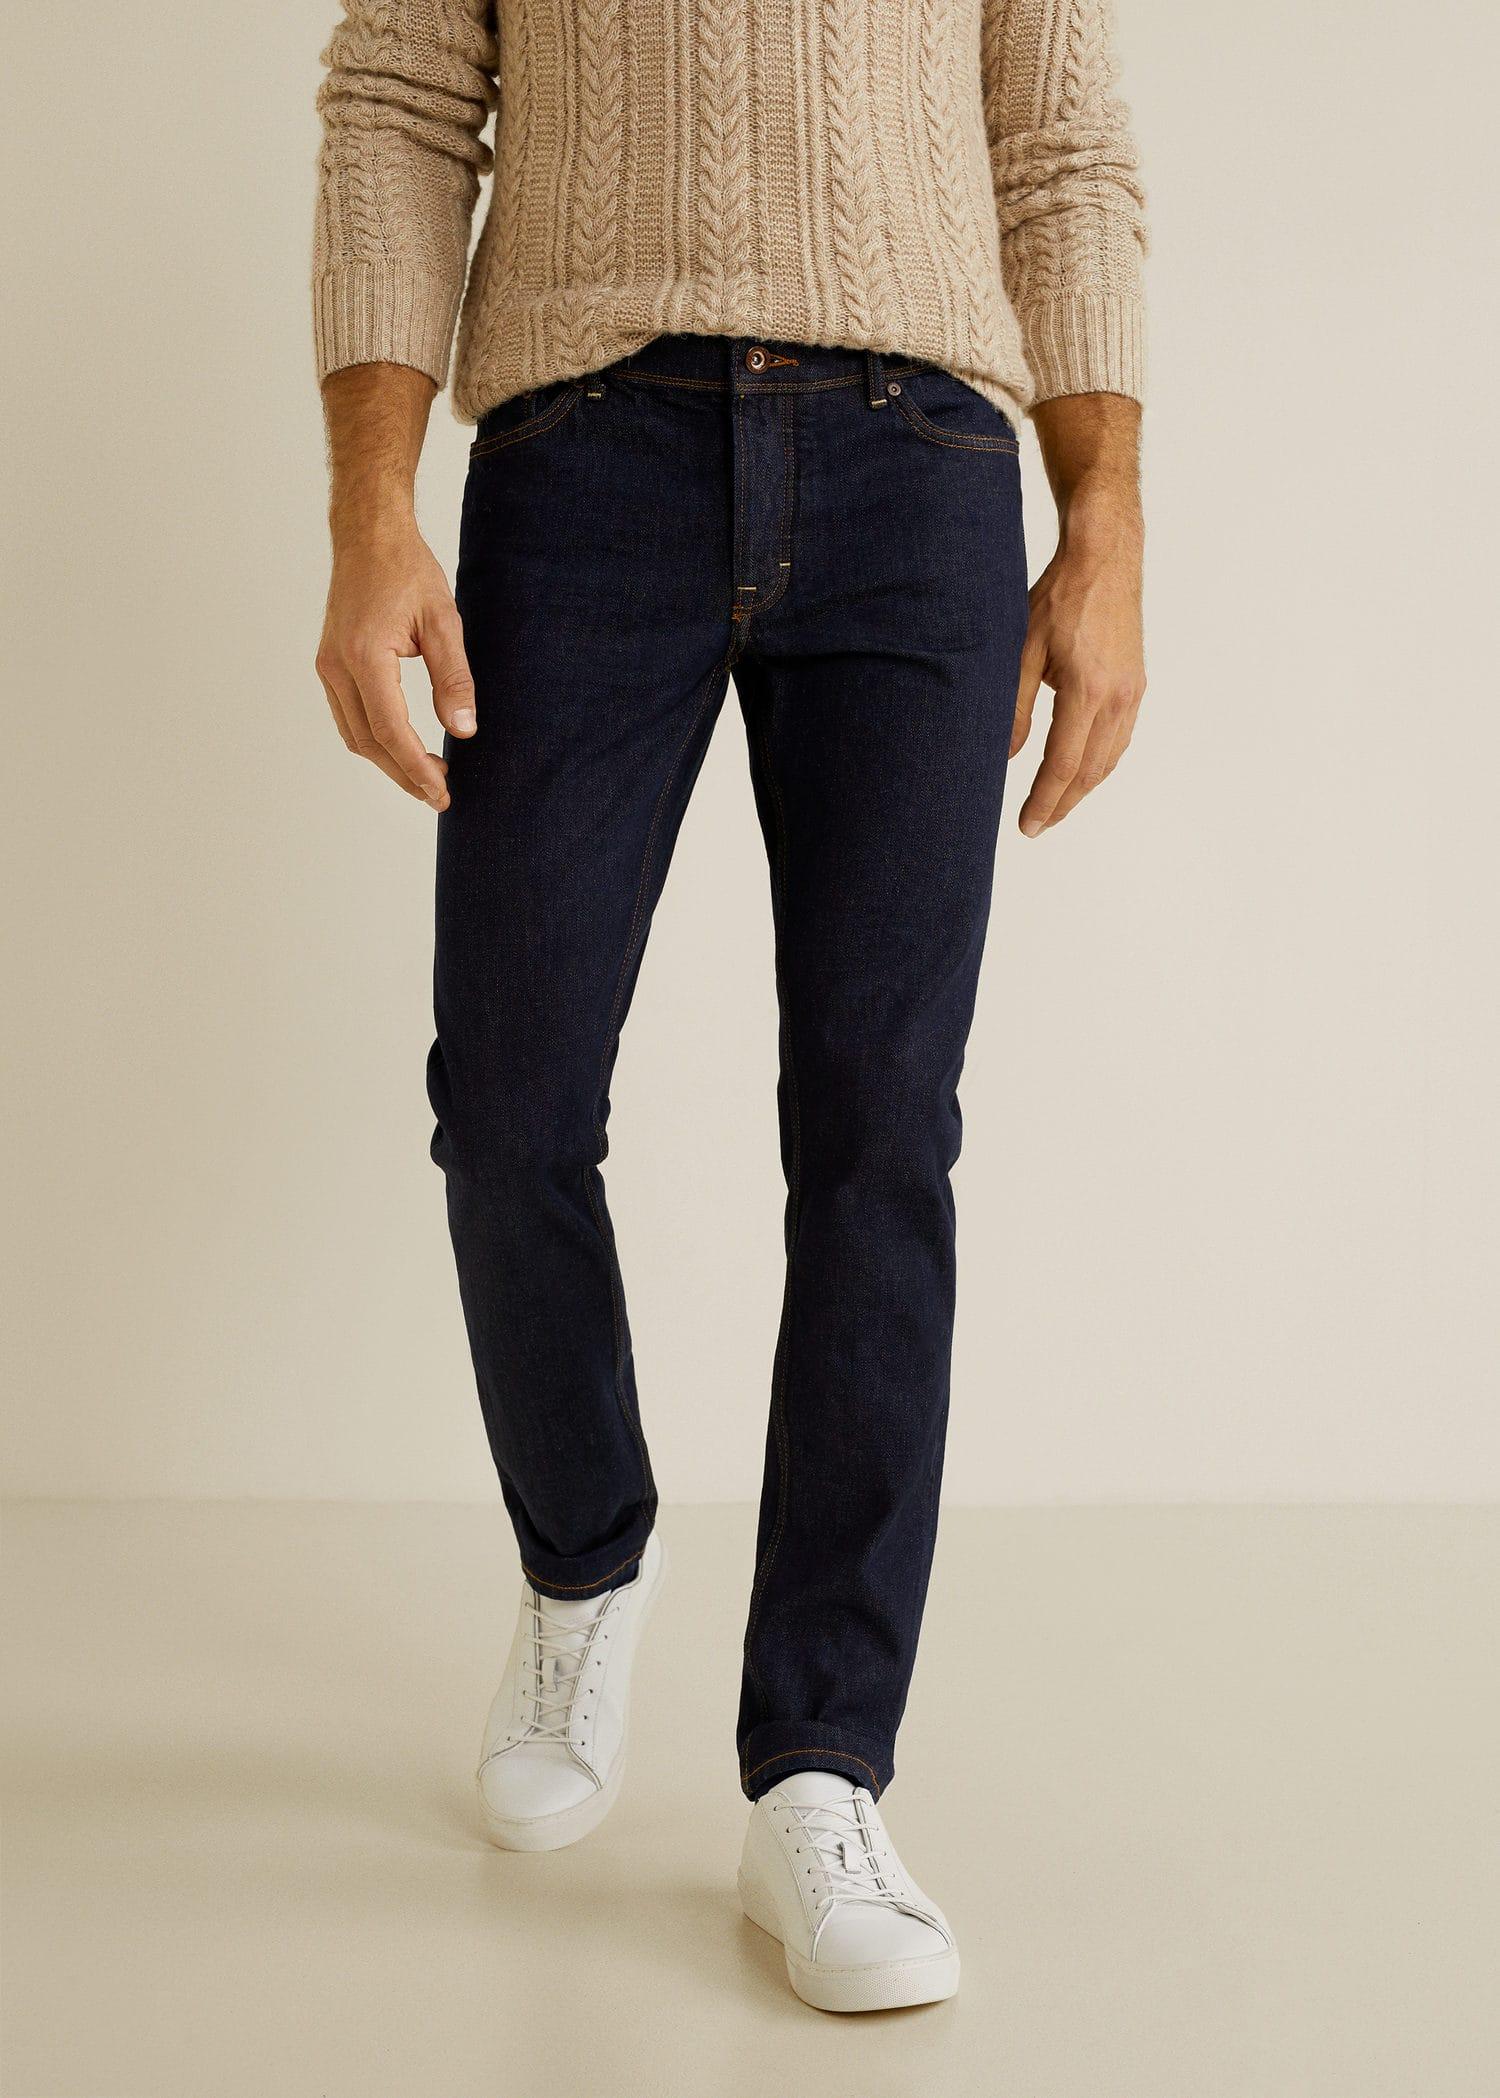 Lavado Hombre Slim Jeans Man Mango Oscuro Fit España Tim zgxwt